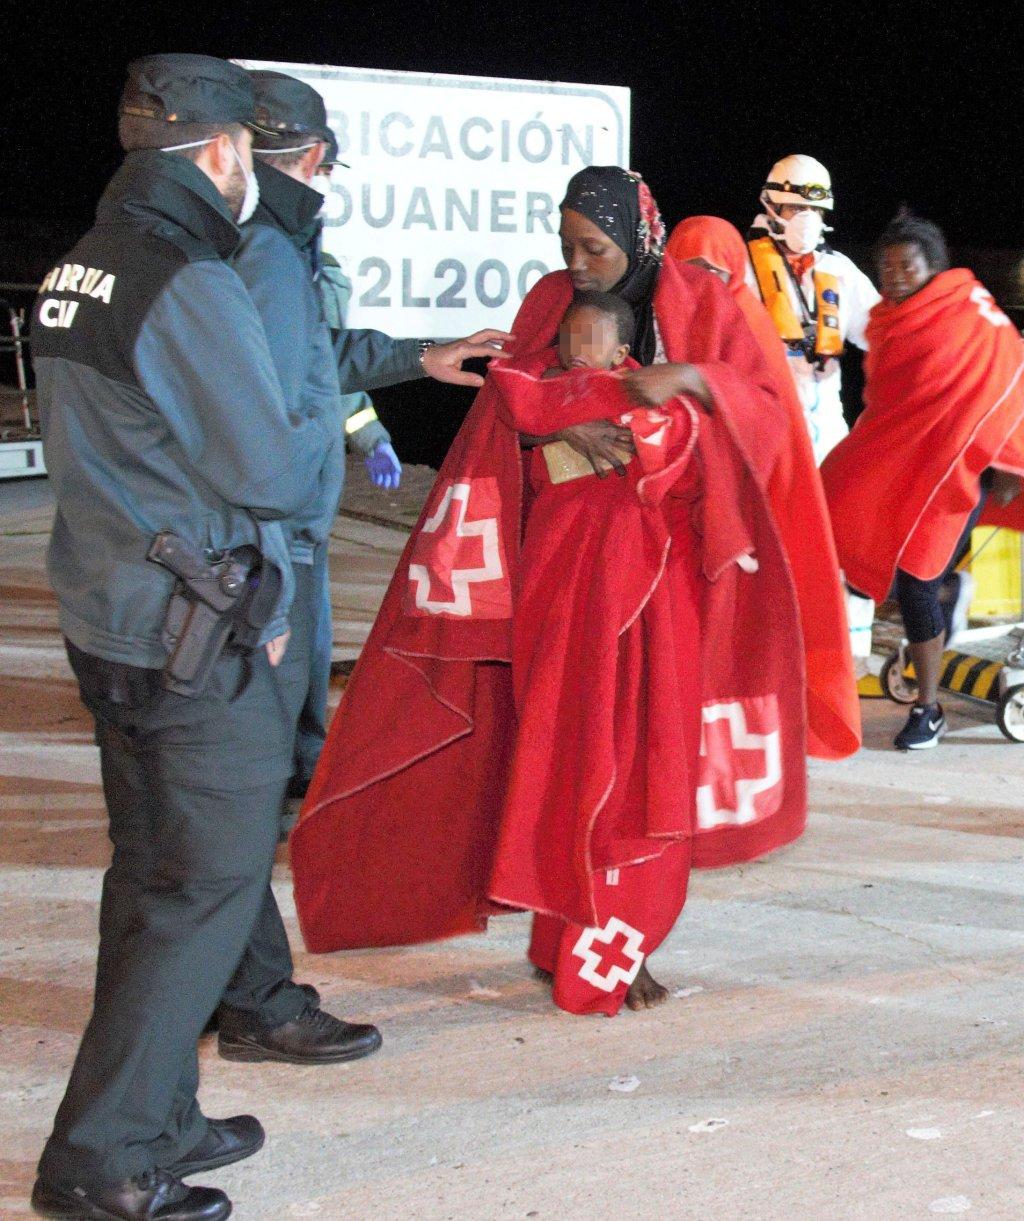 ANSA / مهاجرة وطفلها أمام عناصر الشرطة في ميناء موتريل في جنوب إسبانيا. أرشيف